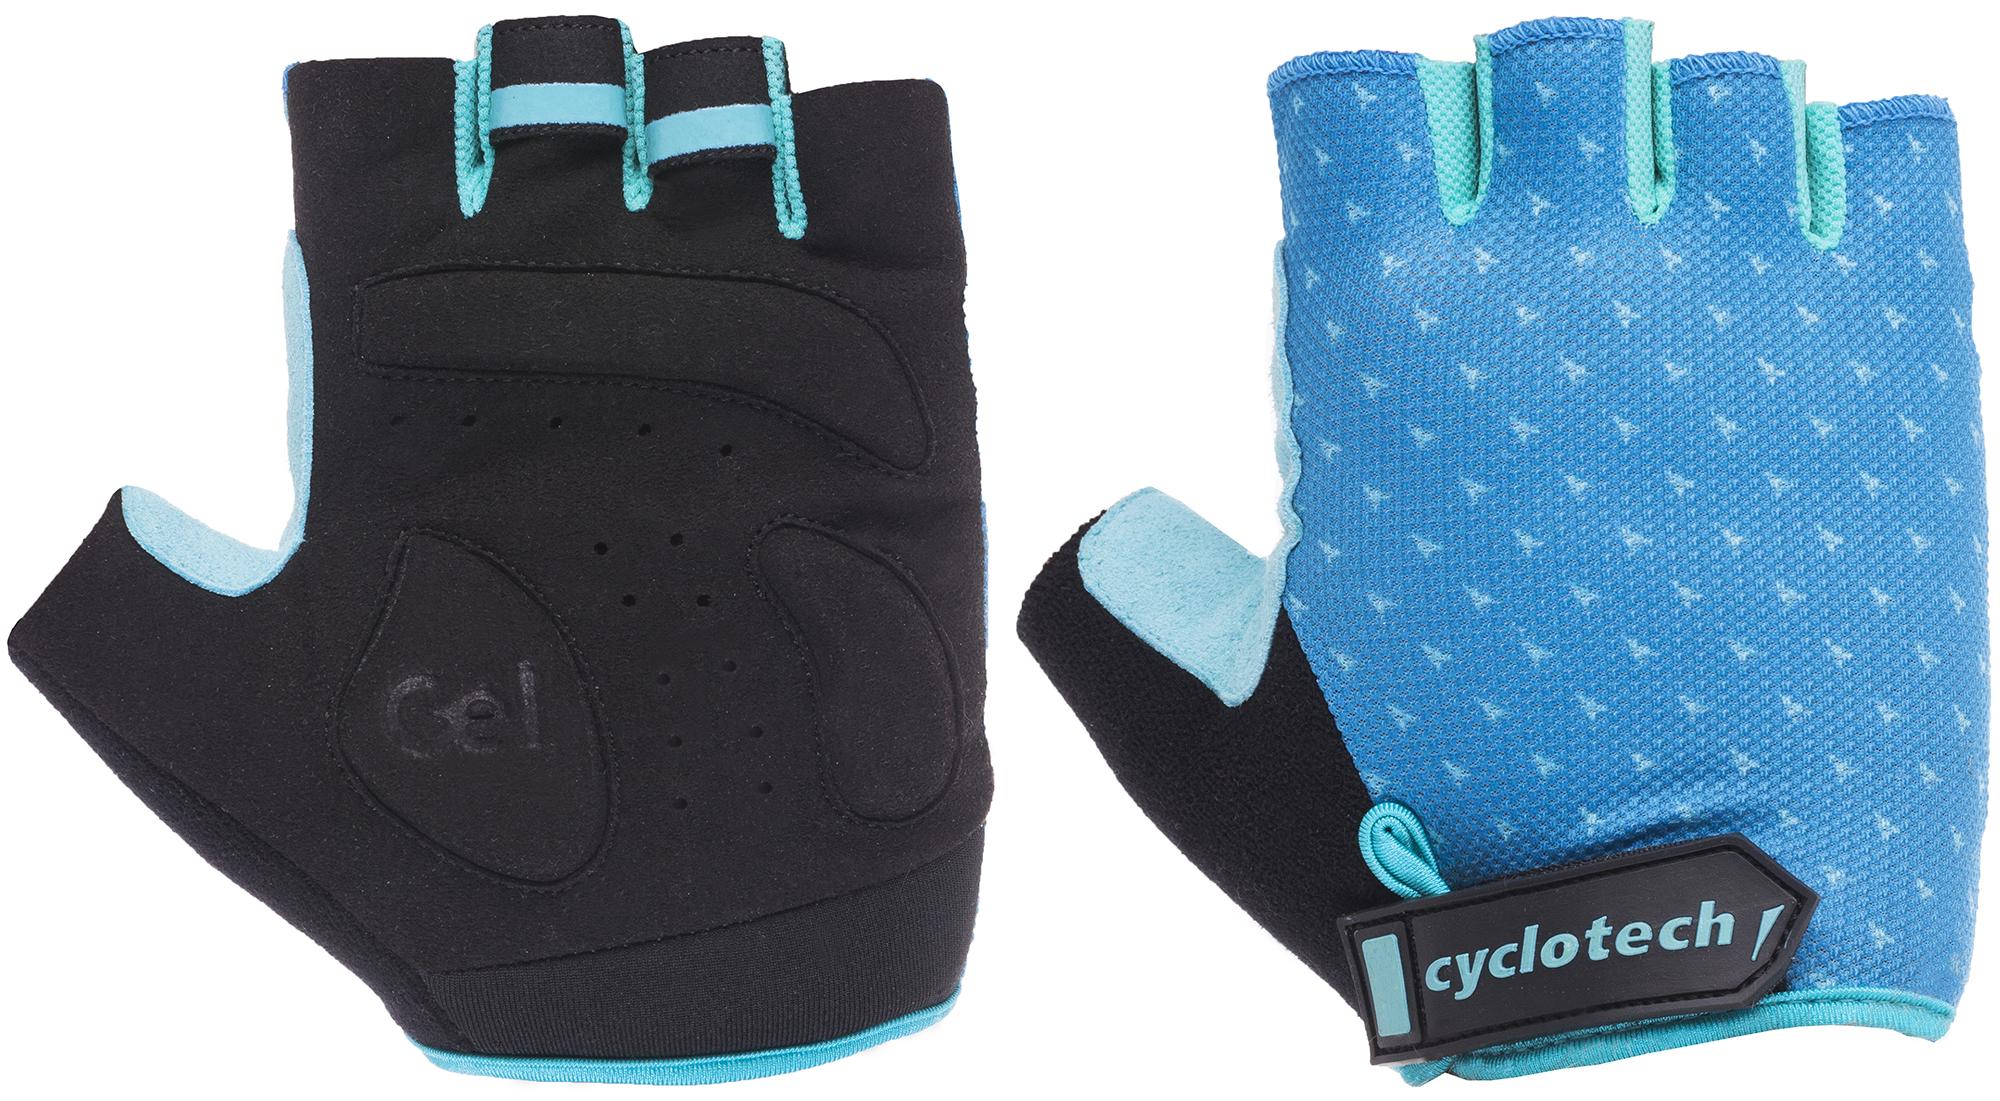 Cyclotech Перчатки велосипедные Cyclotech Hoya cyclotech перчатки велосипедные cyclotech canna